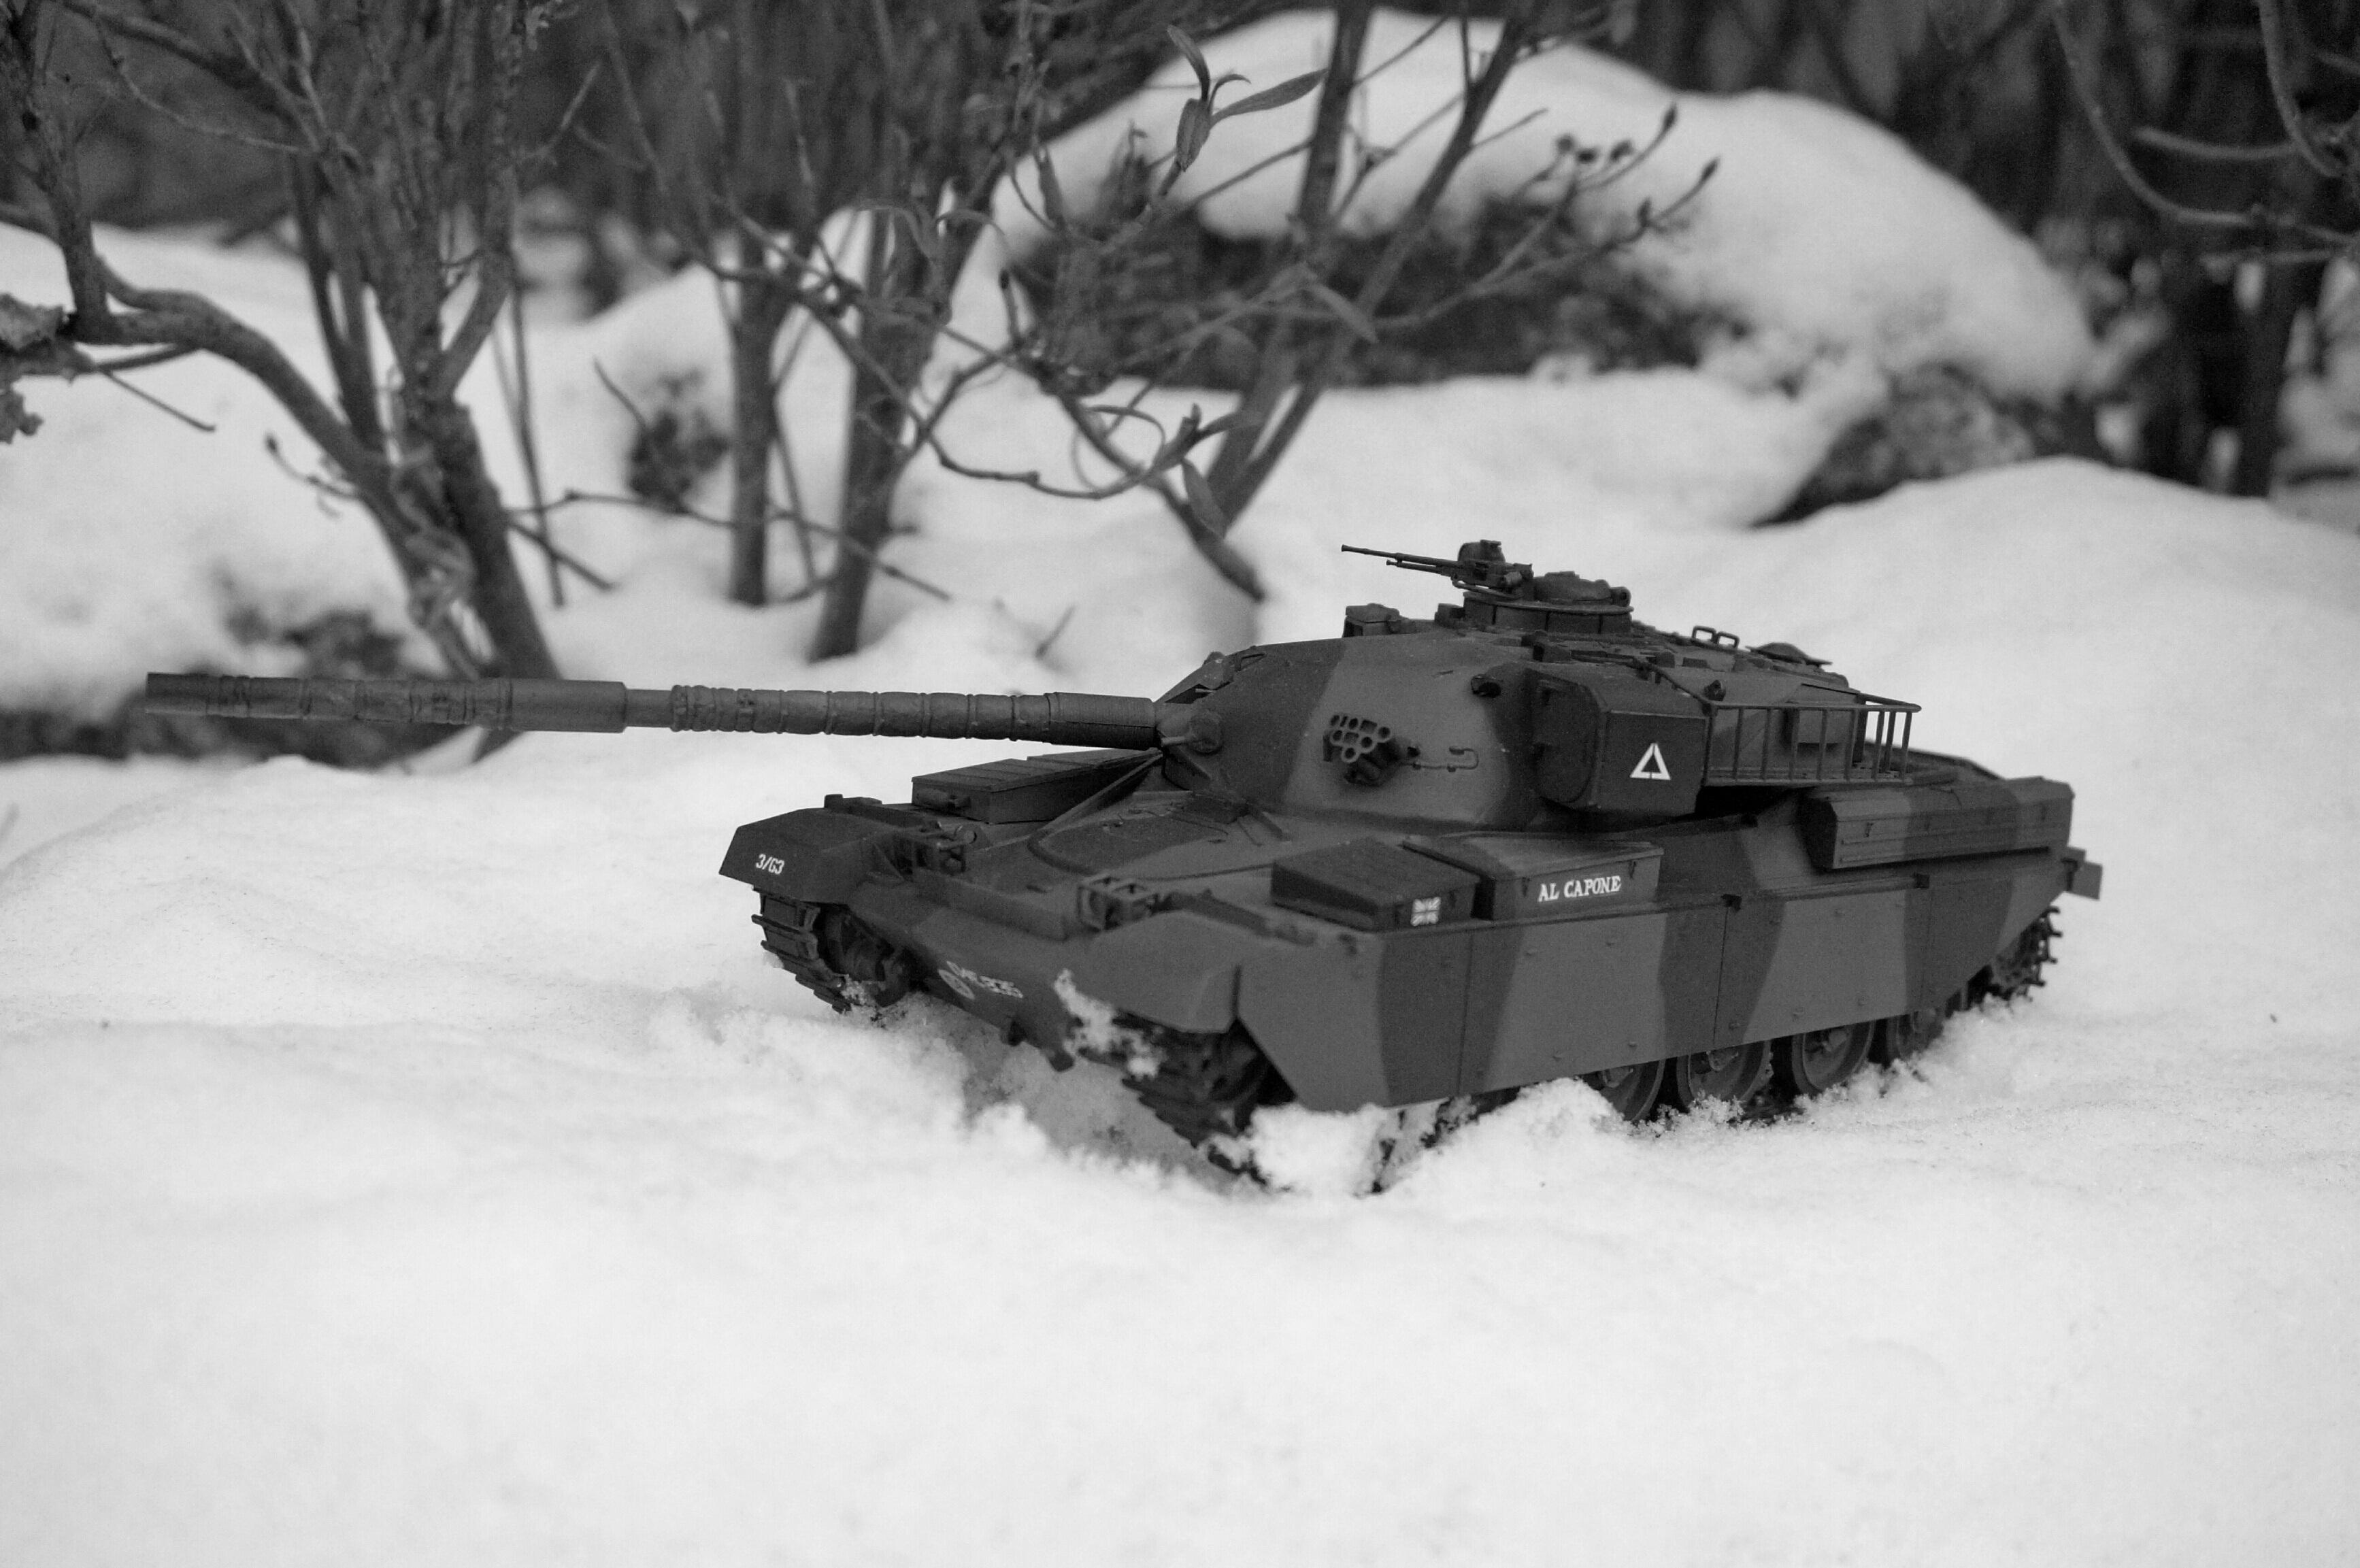 танки зимой картинки древности честь татарника